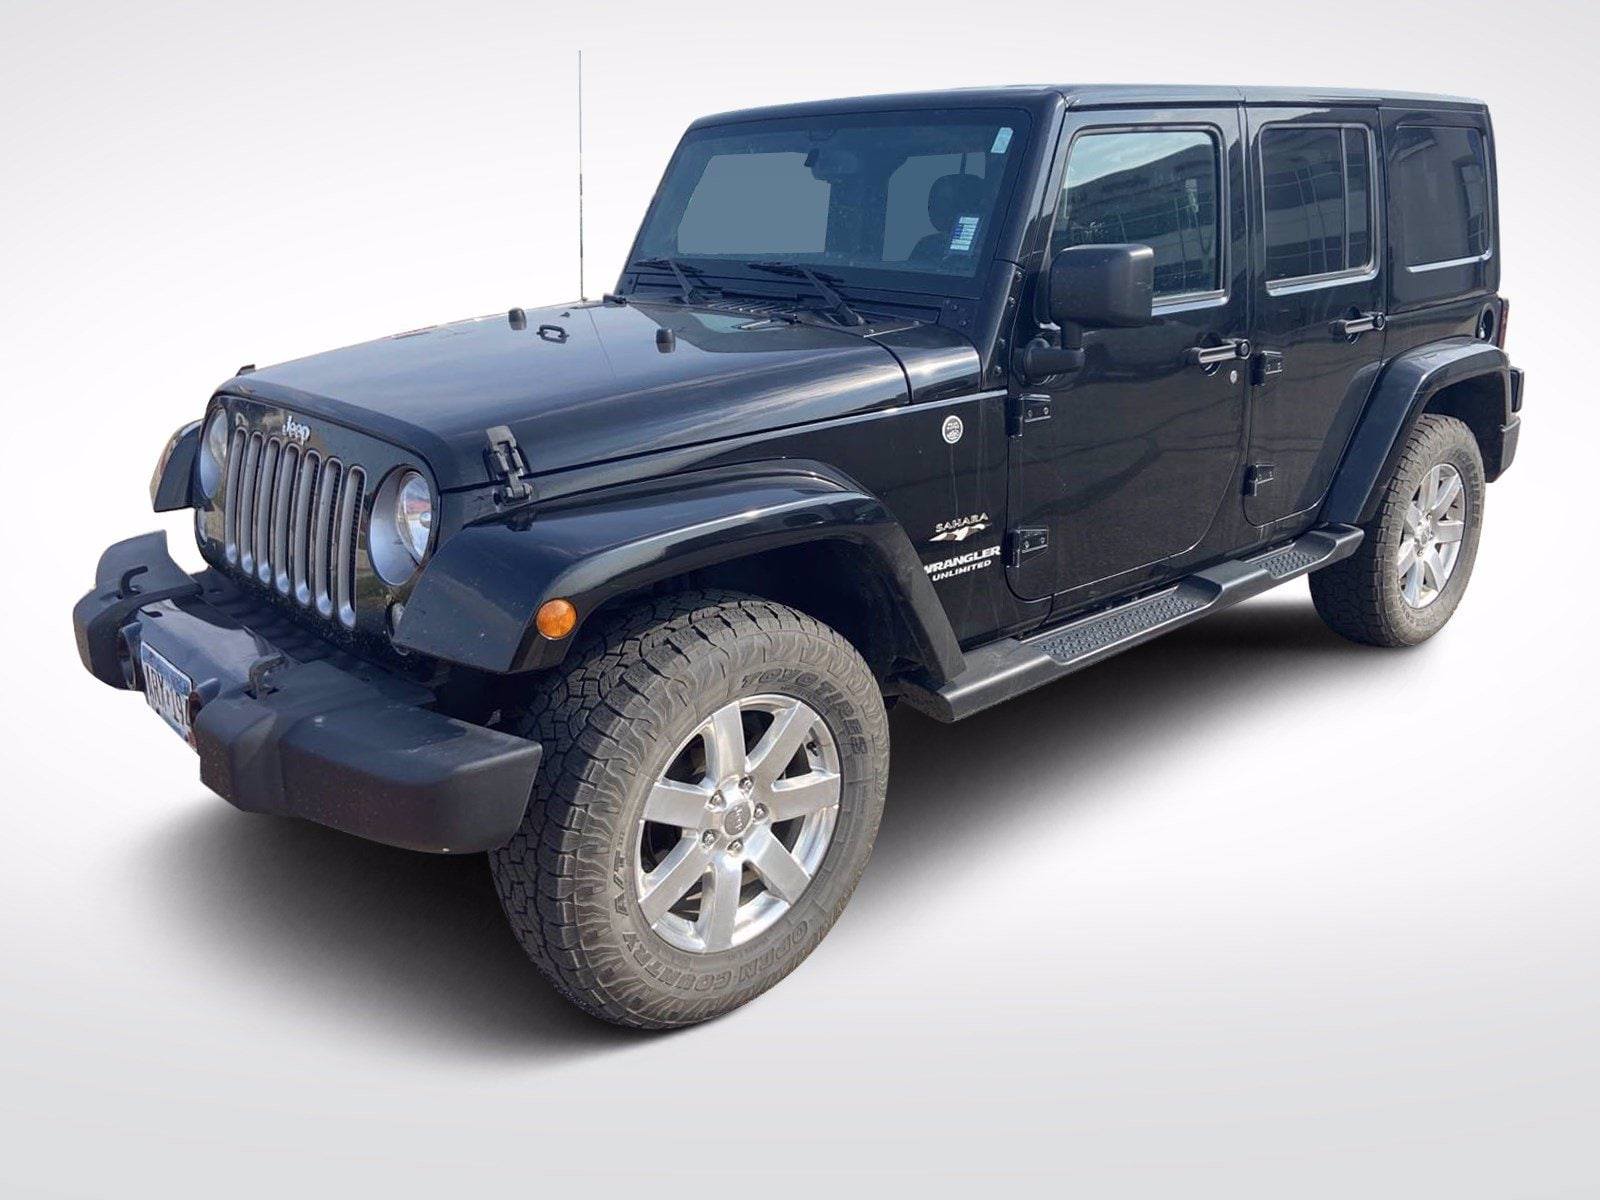 Used 2017 Jeep Wrangler Unlimited Sahara with VIN 1C4BJWEG4HL542551 for sale in Willmar, Minnesota